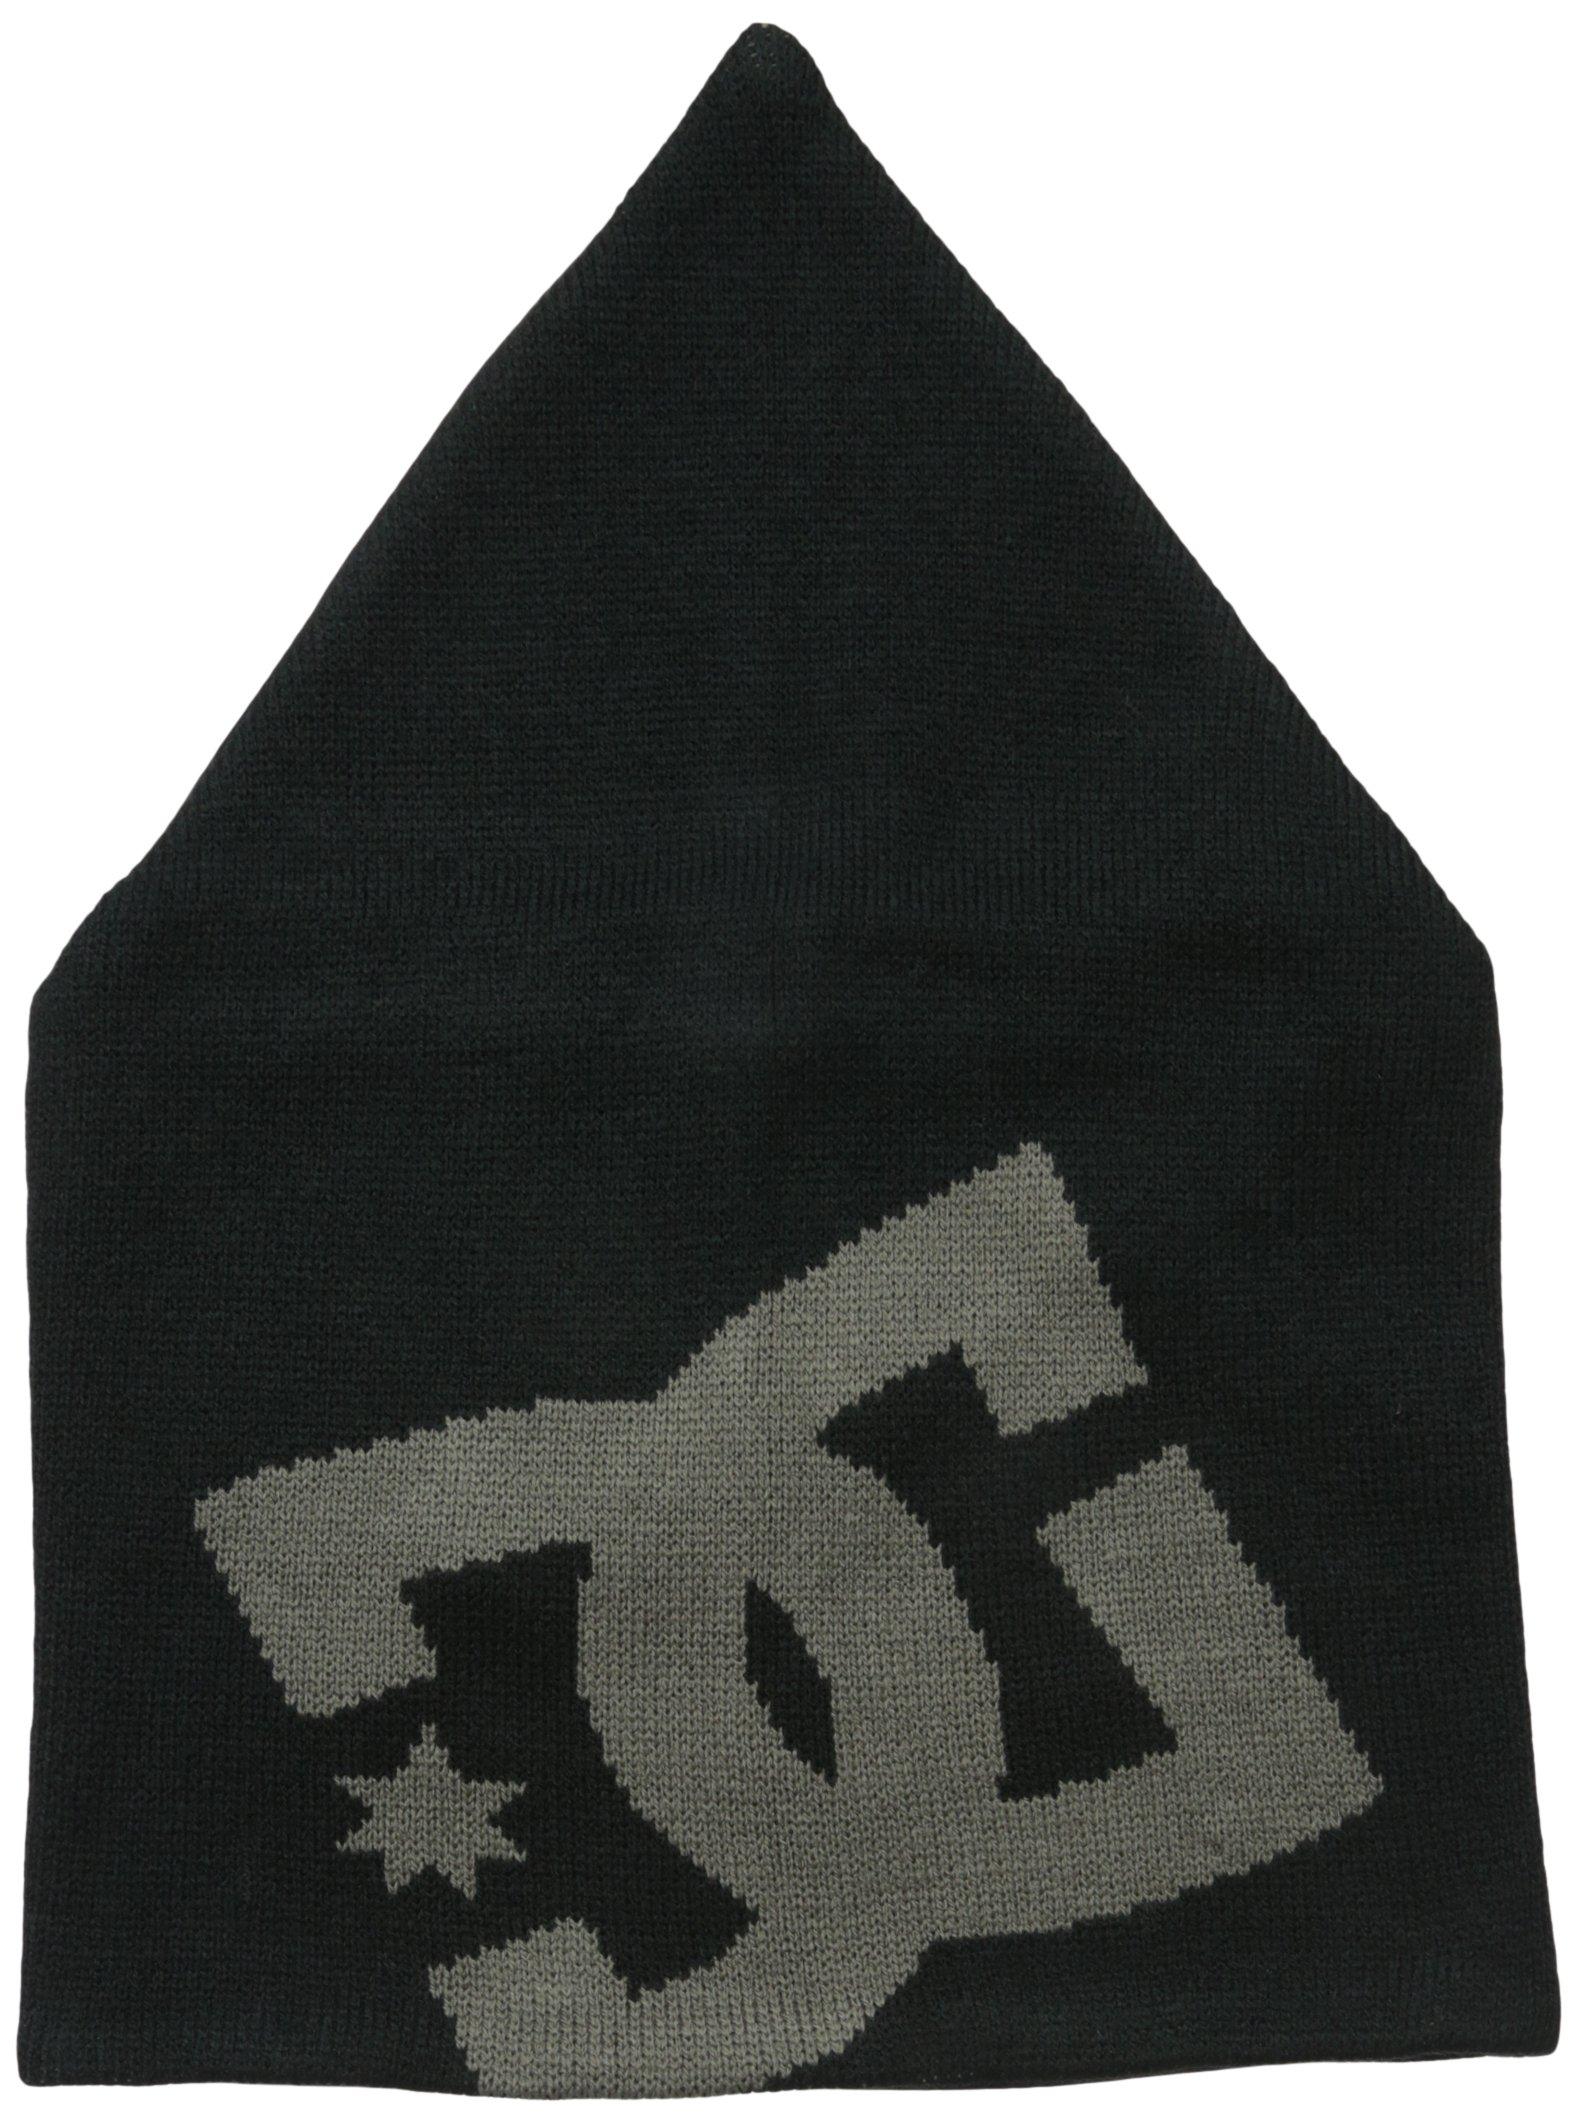 DC Men's Yad Neck Warmer, Black, One Size